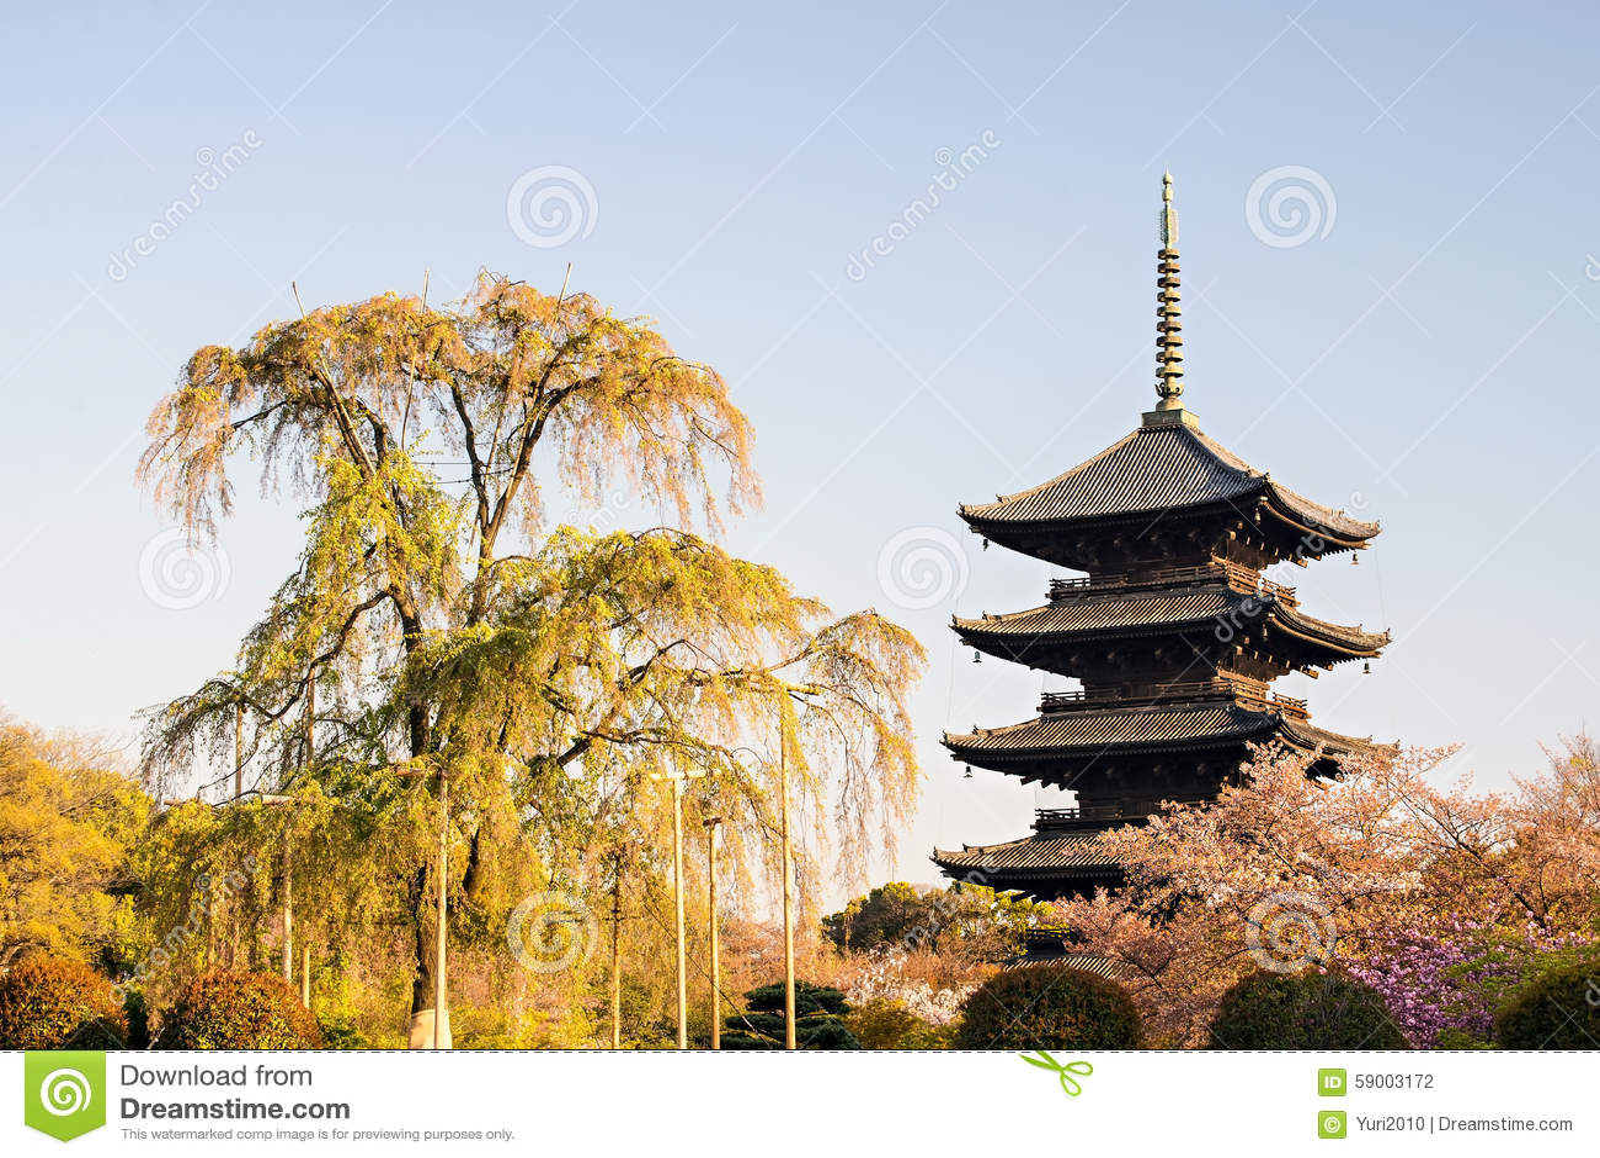 Kyoto, Japan at Toji temple